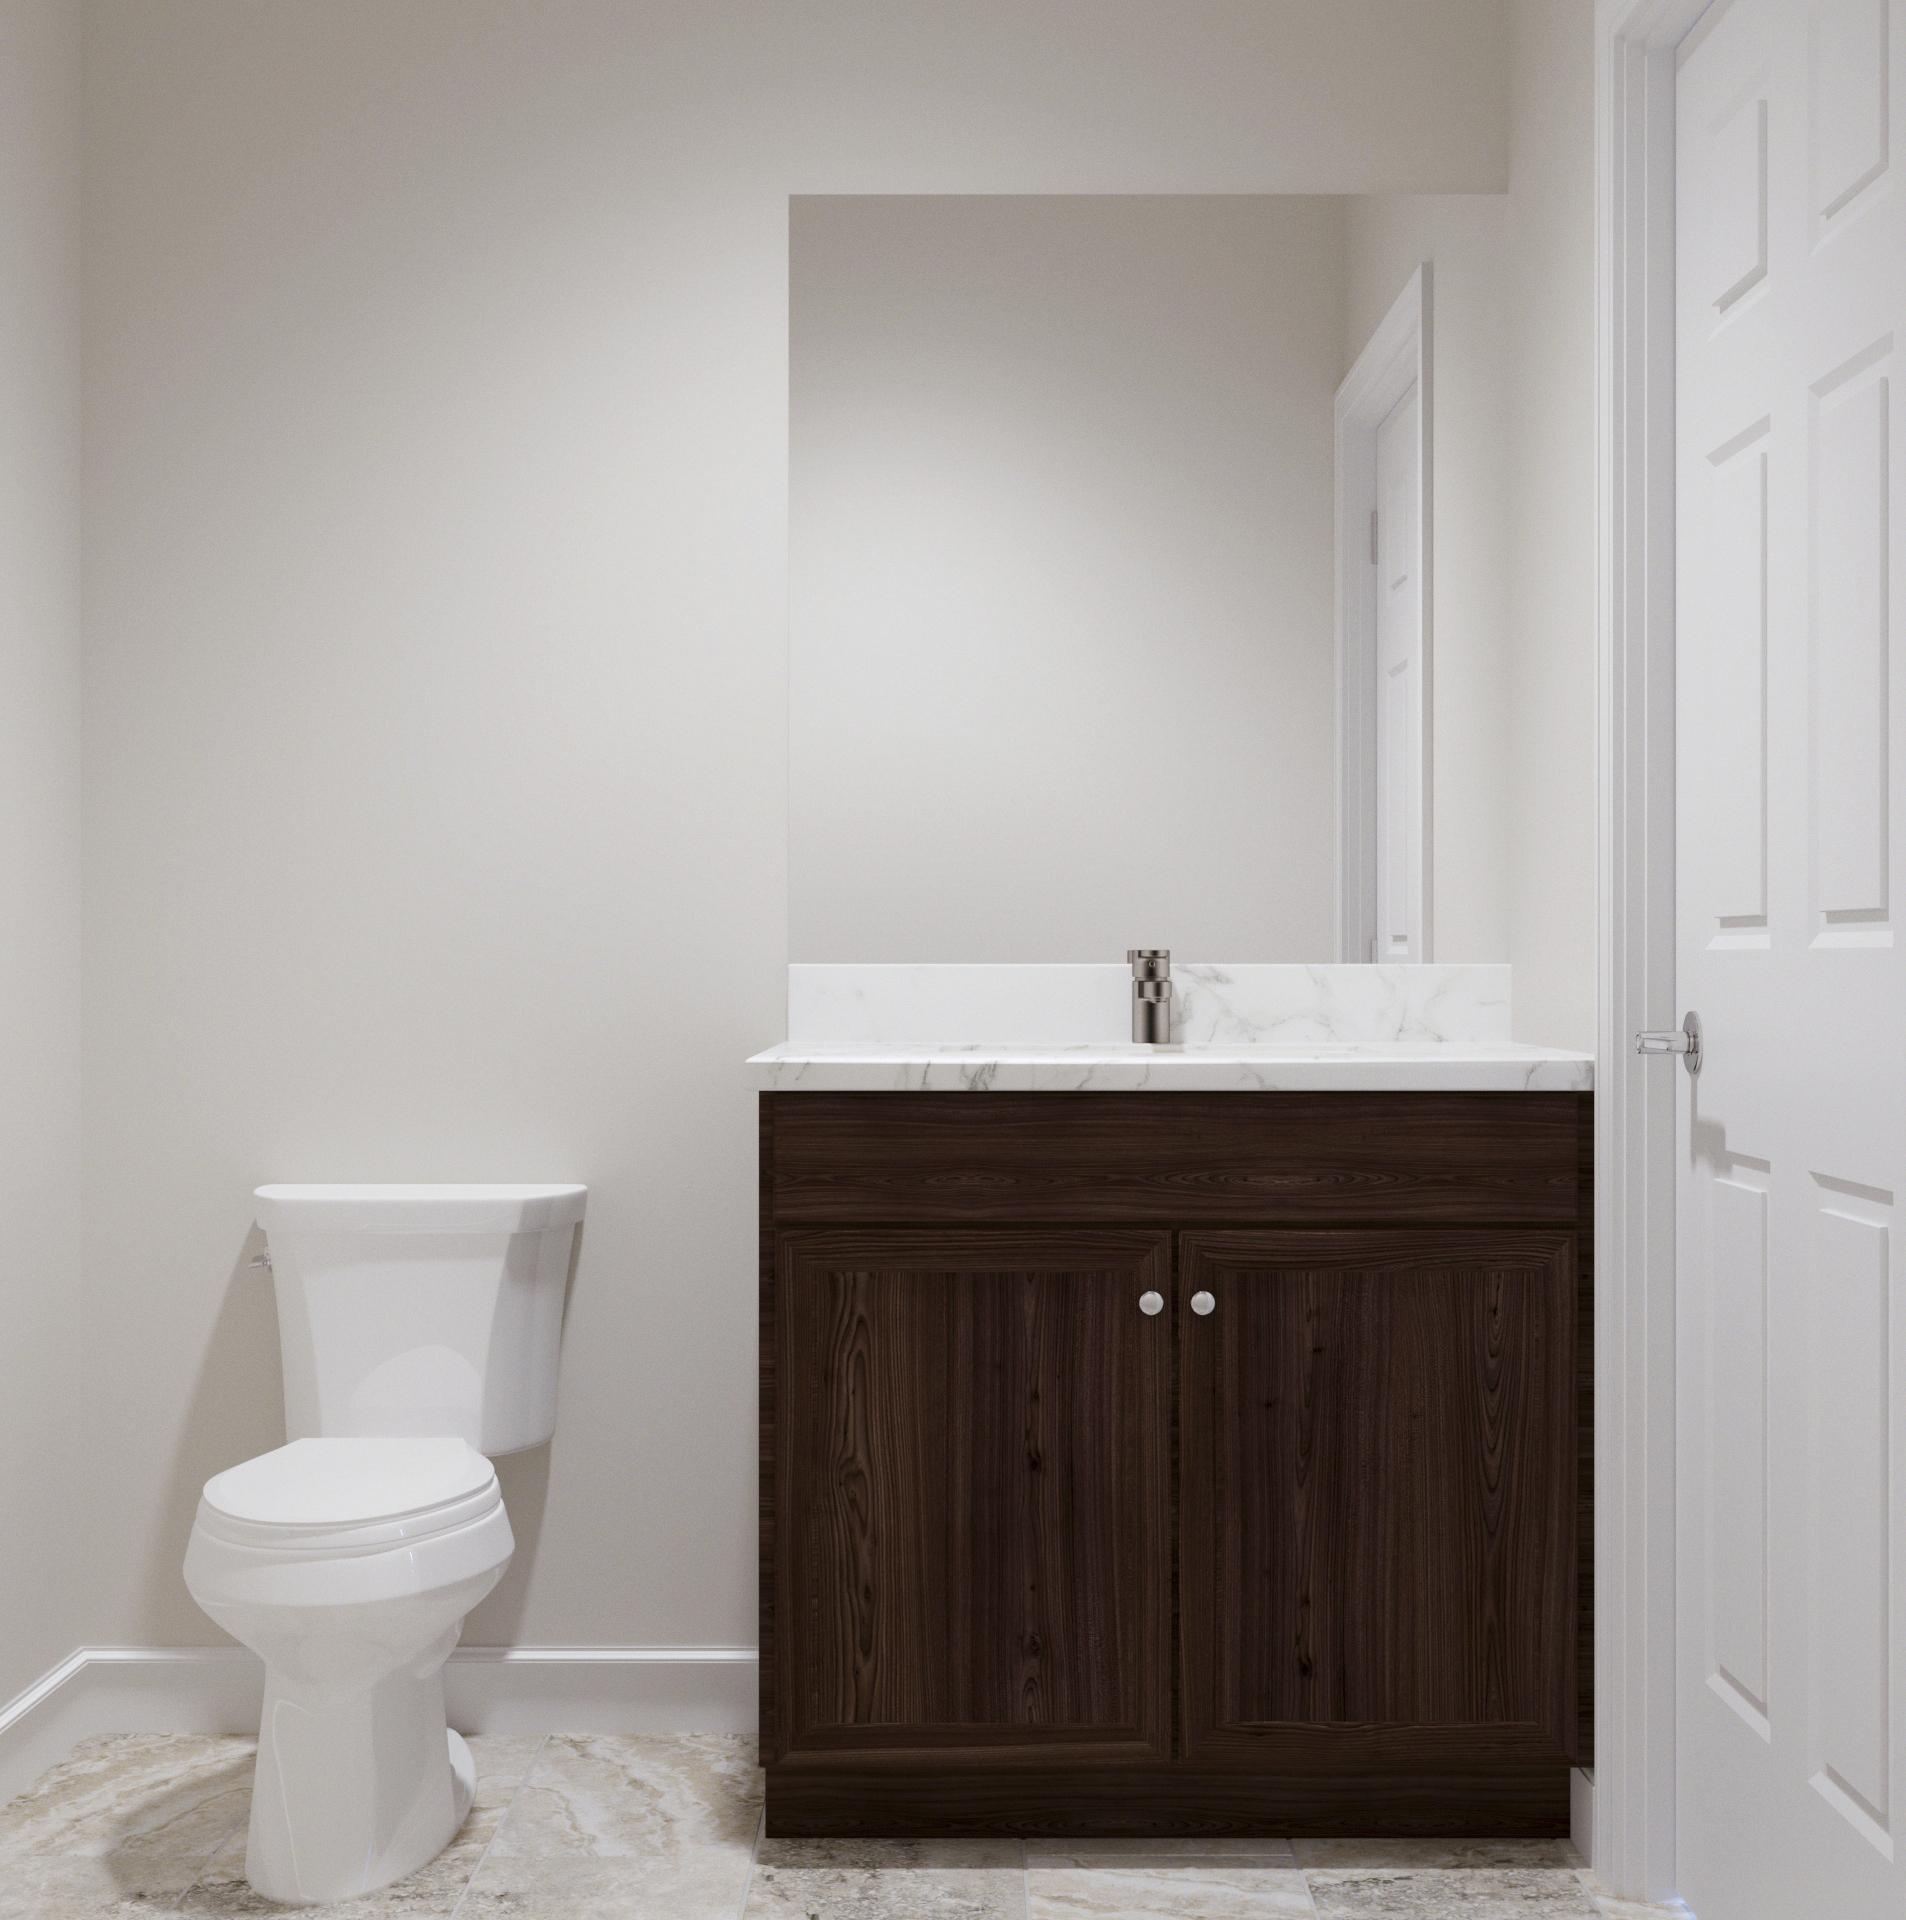 6. Logan_1st floor_bathroom.jpg